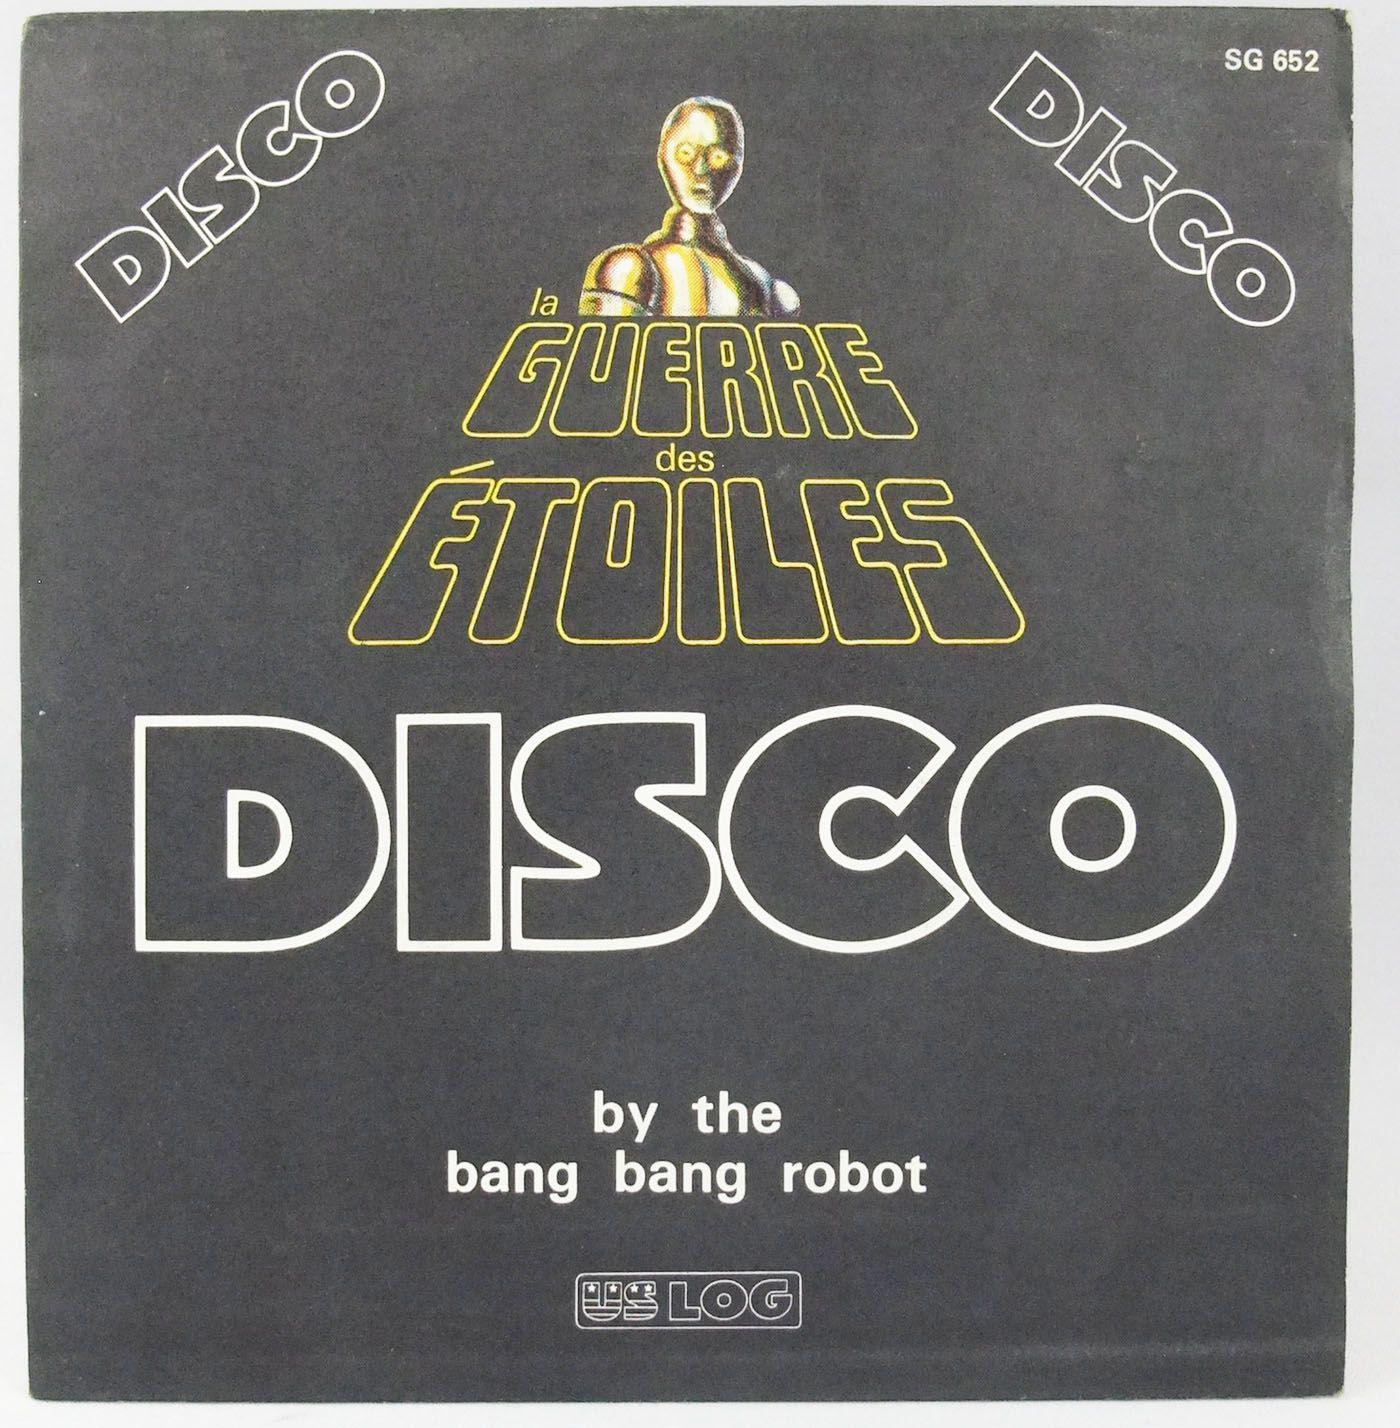 La Guerre des Etoiles Disco by Bang Bang Robot - Disque 45t - US Log Discodis 1977